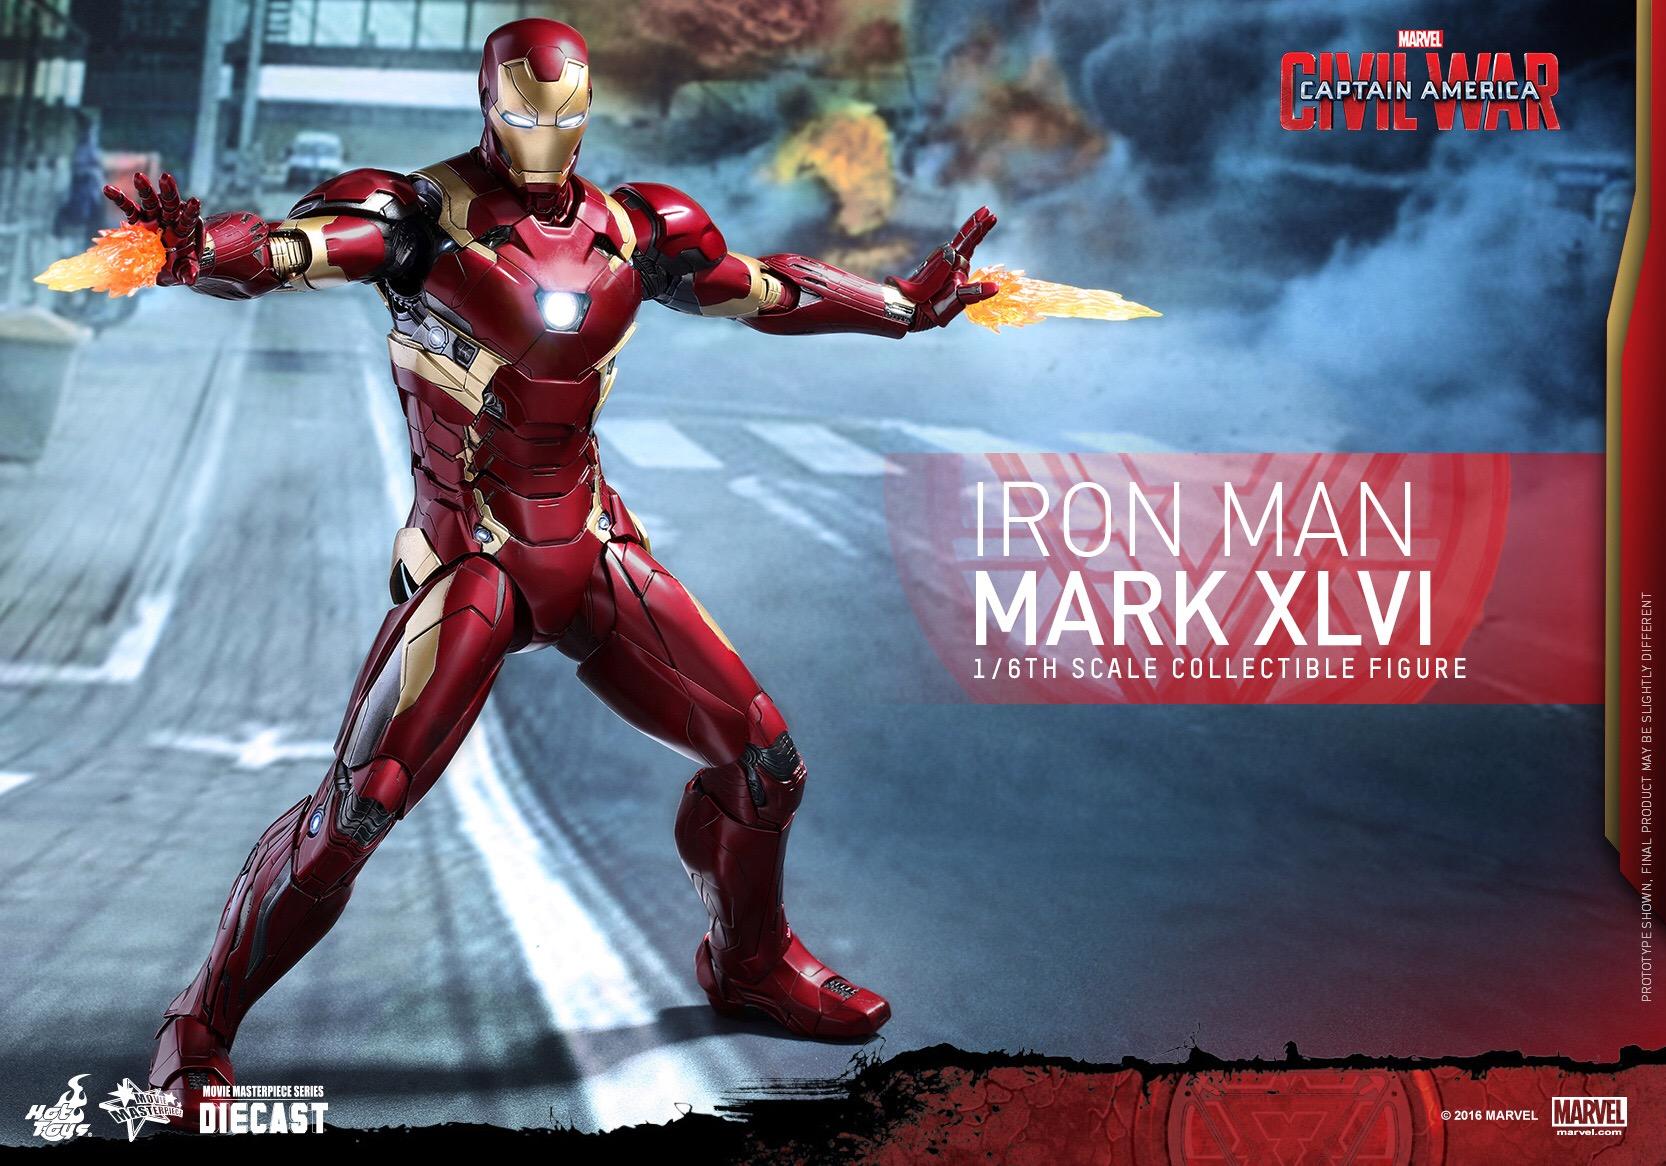 CAPTAIN AMERICA : CIVIL WAR - IRON MAN MARK XLVI (MMS353DC16) 160420020902522980